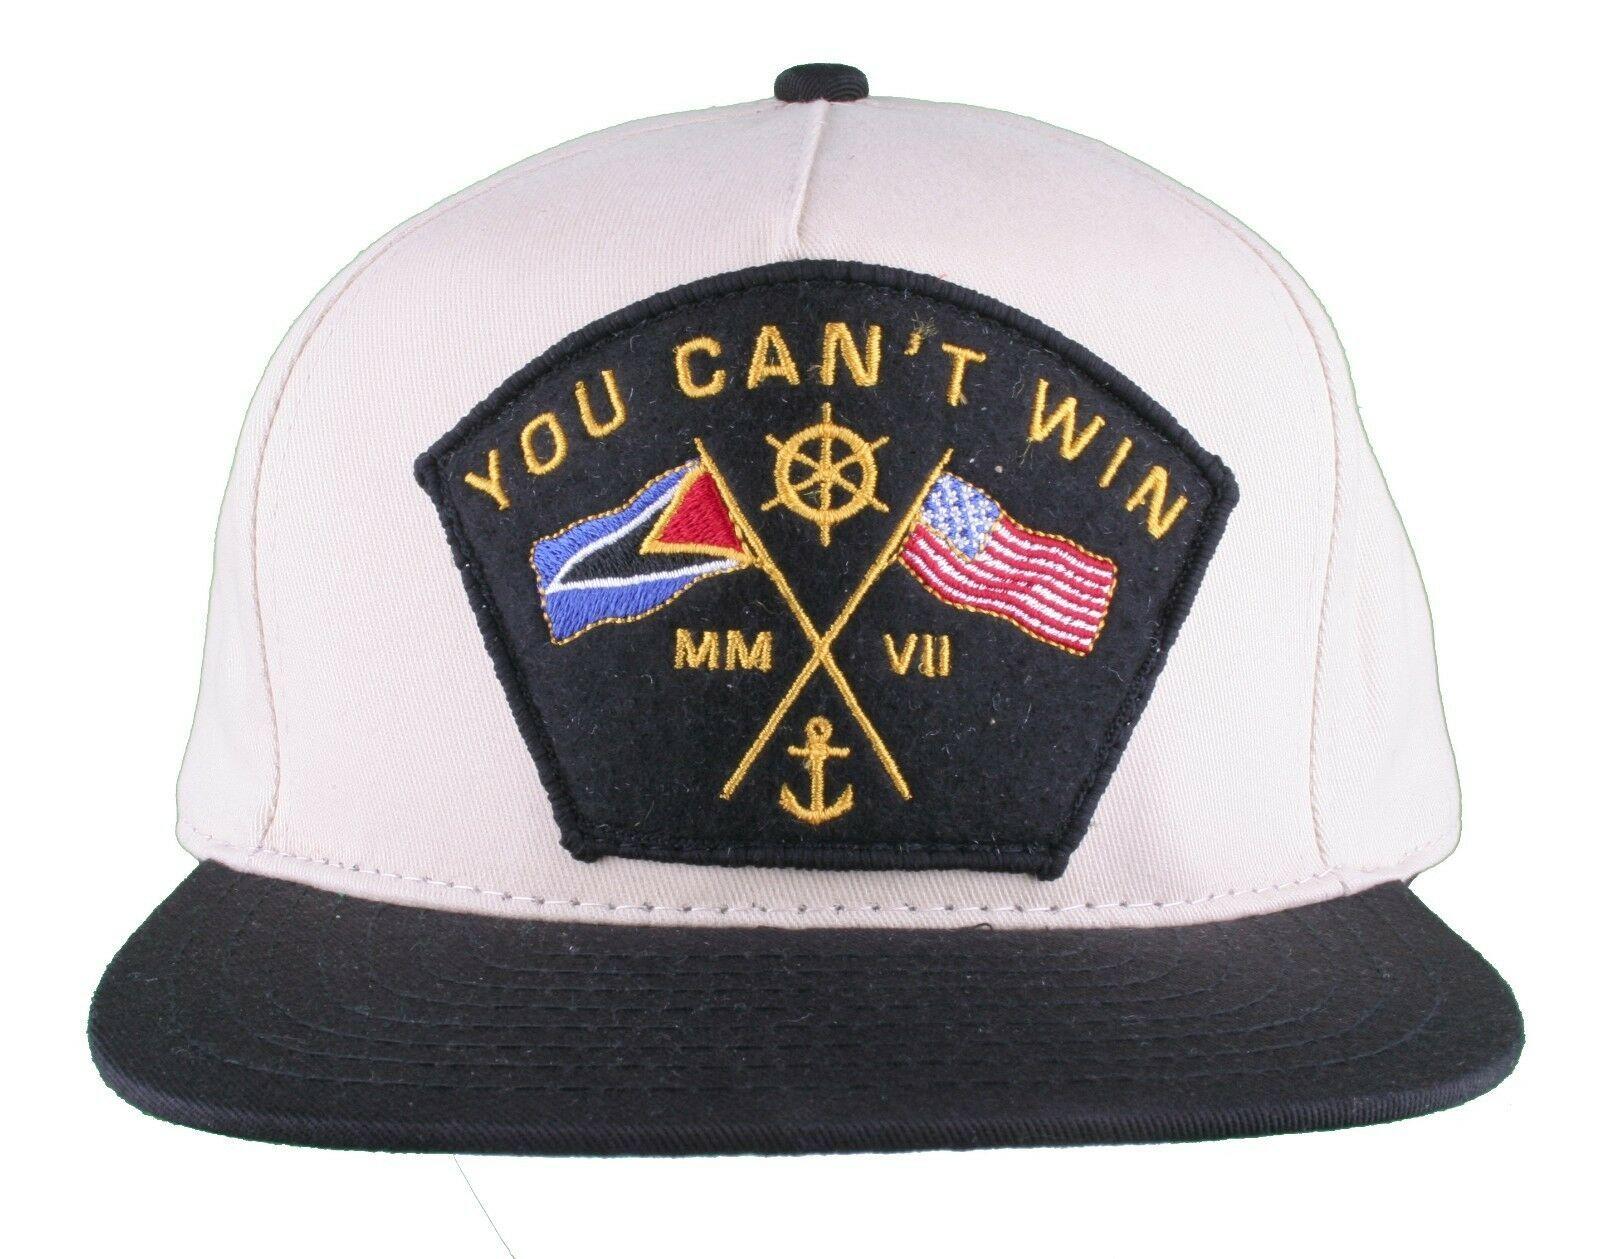 Motivation Voi Can Vinci Navale Crema Beige Cachi Snapback Baseball Cappello Nwt